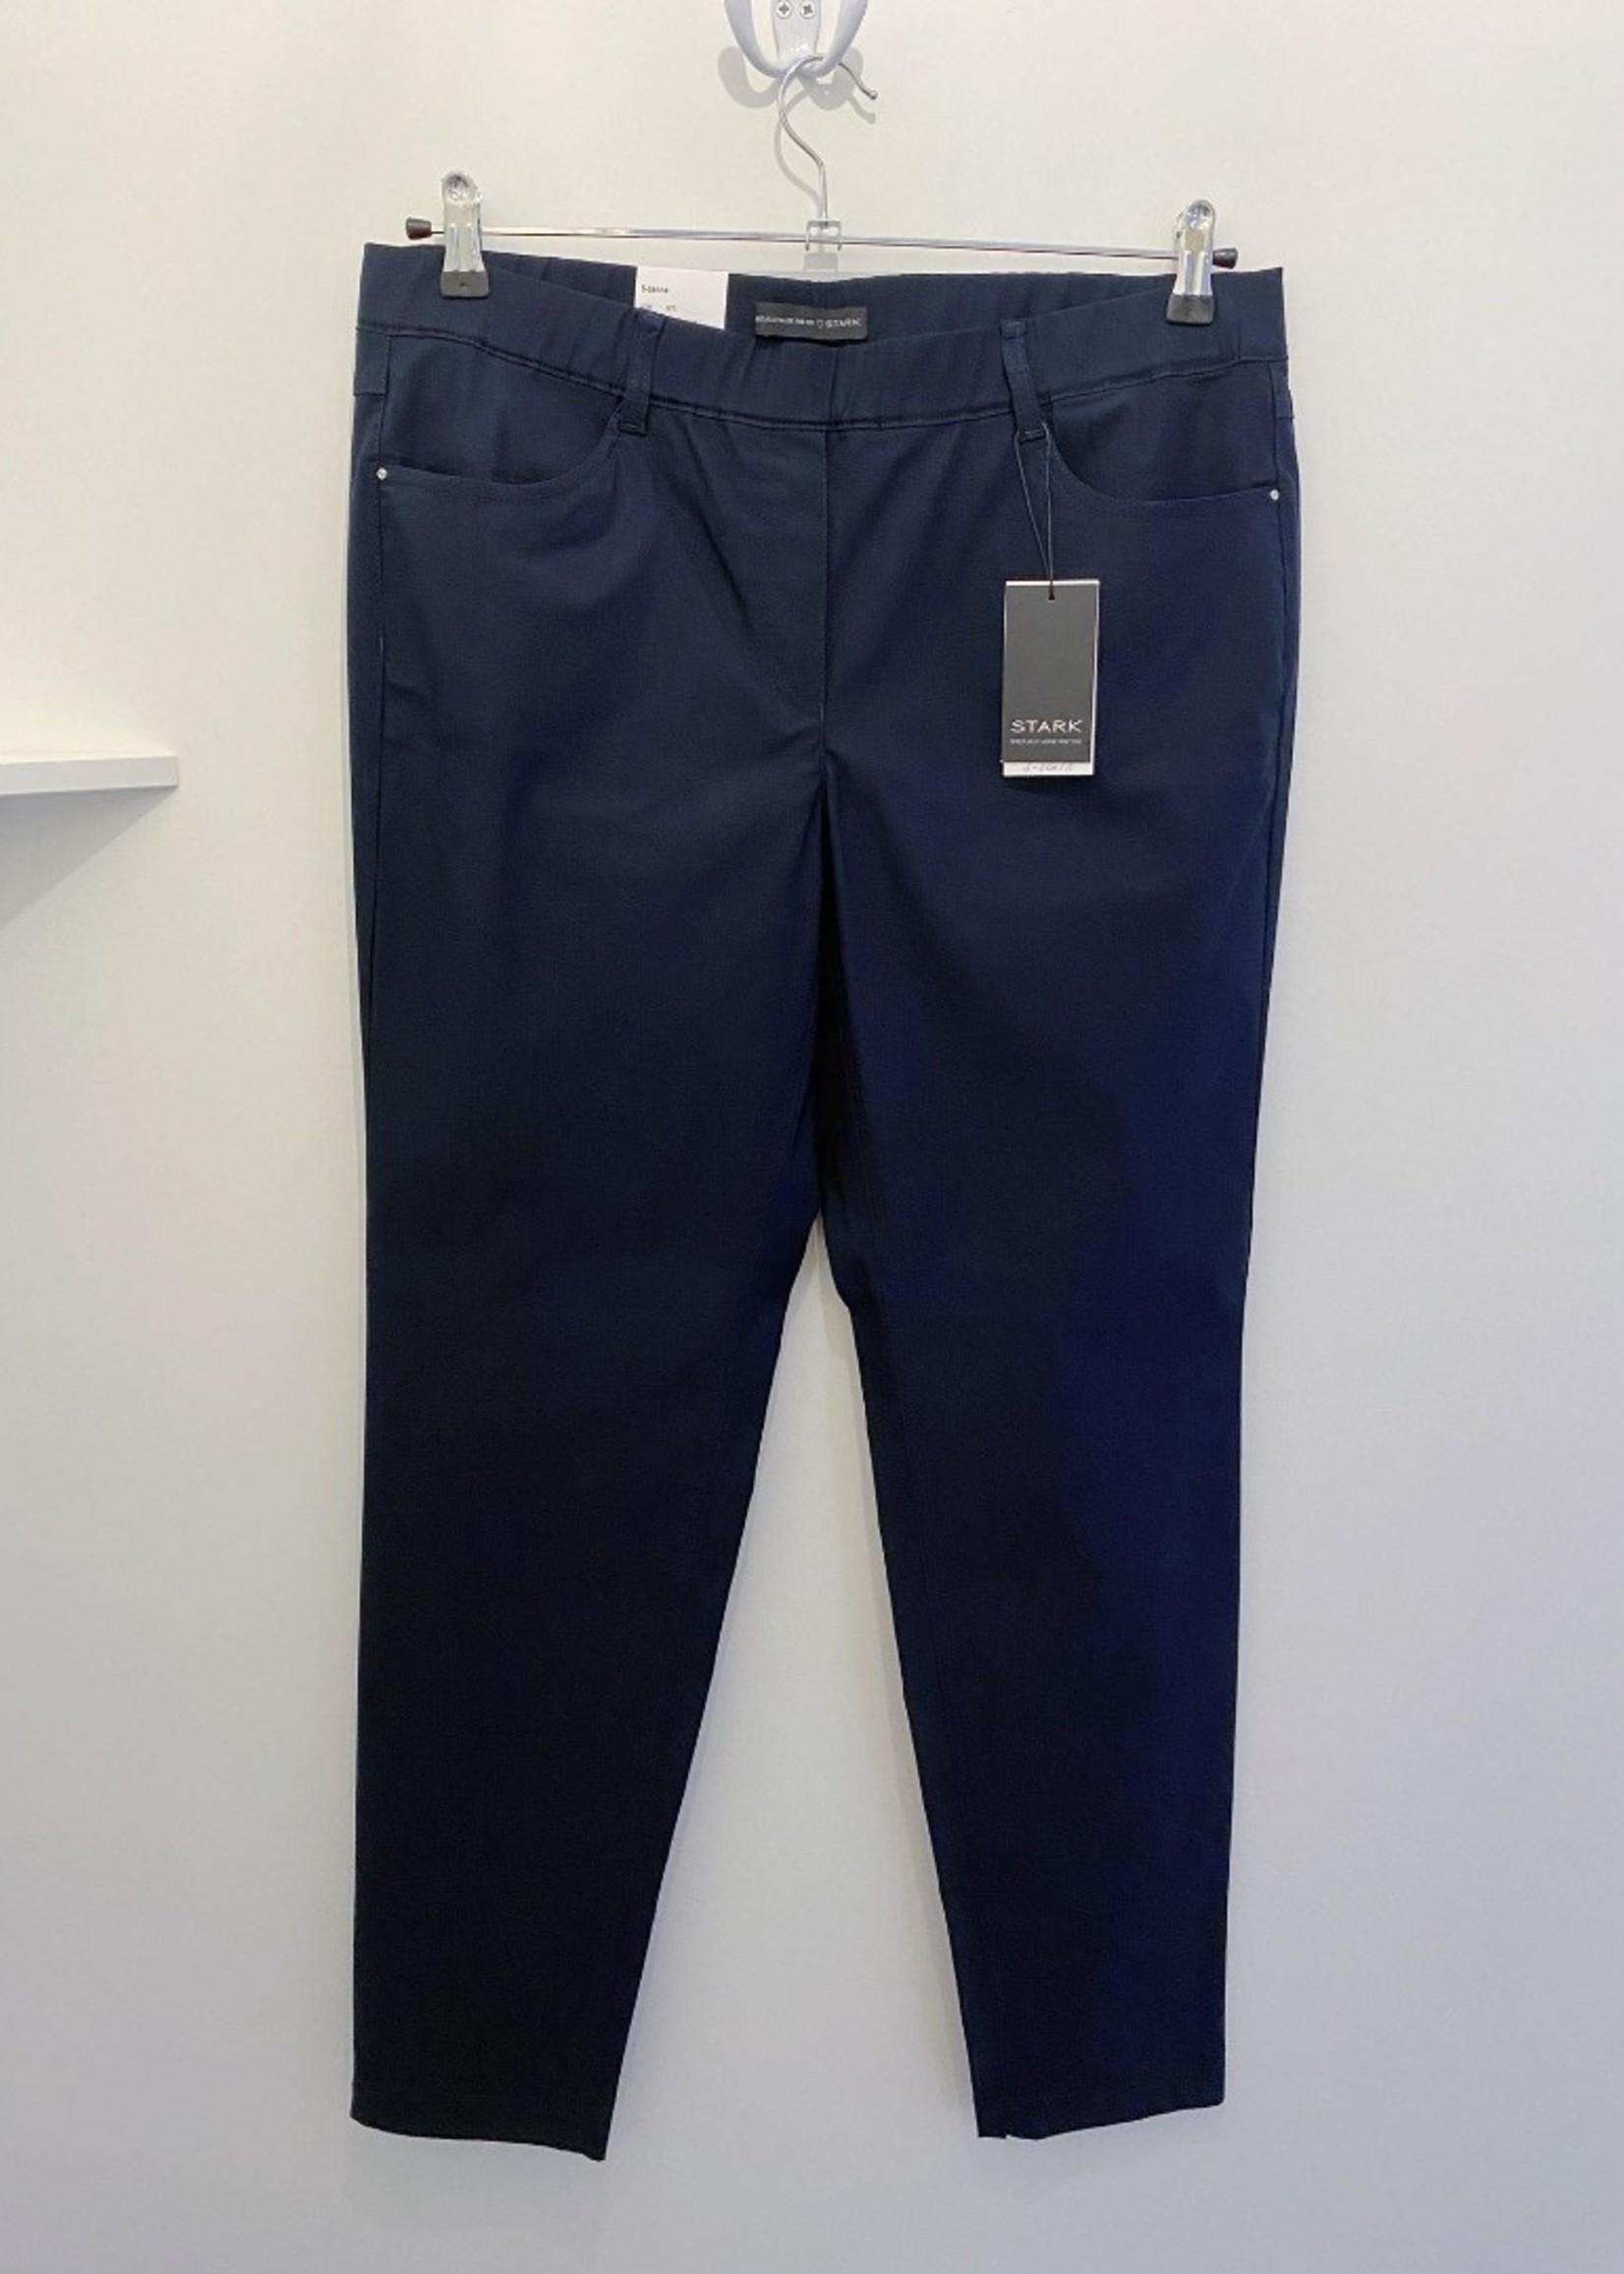 Stark Stark S-Janna Bengaline Pants Dark Blue